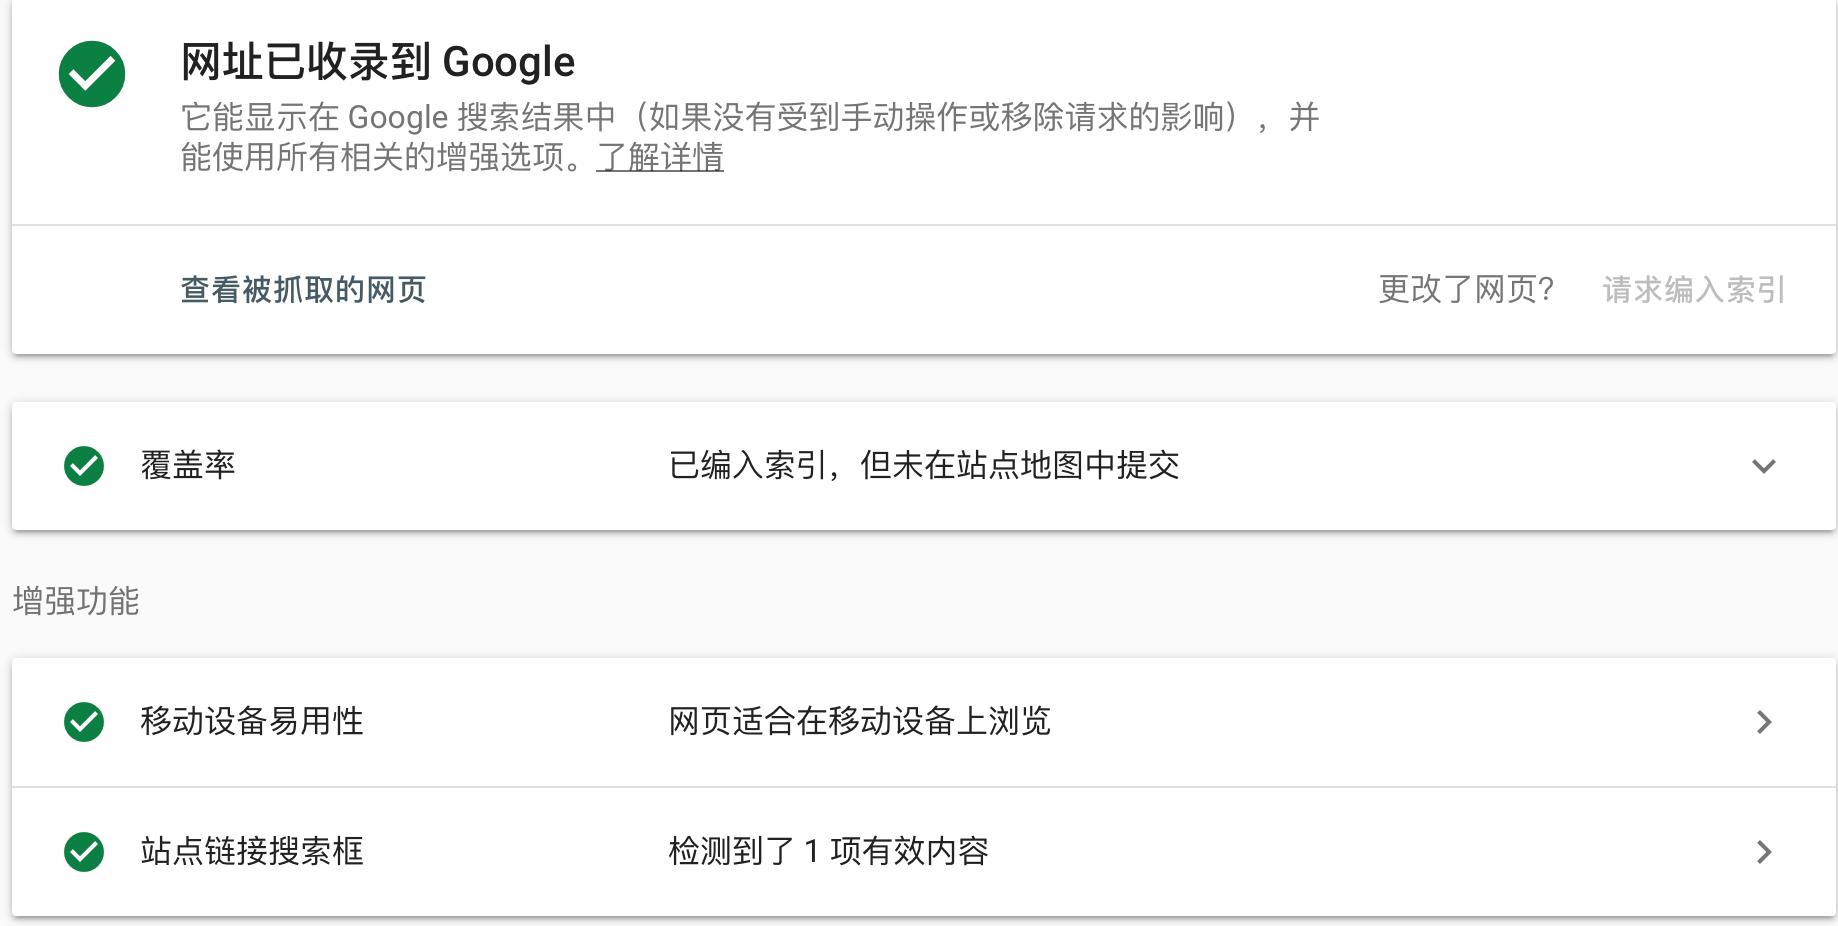 Google search console站长工具网址检查